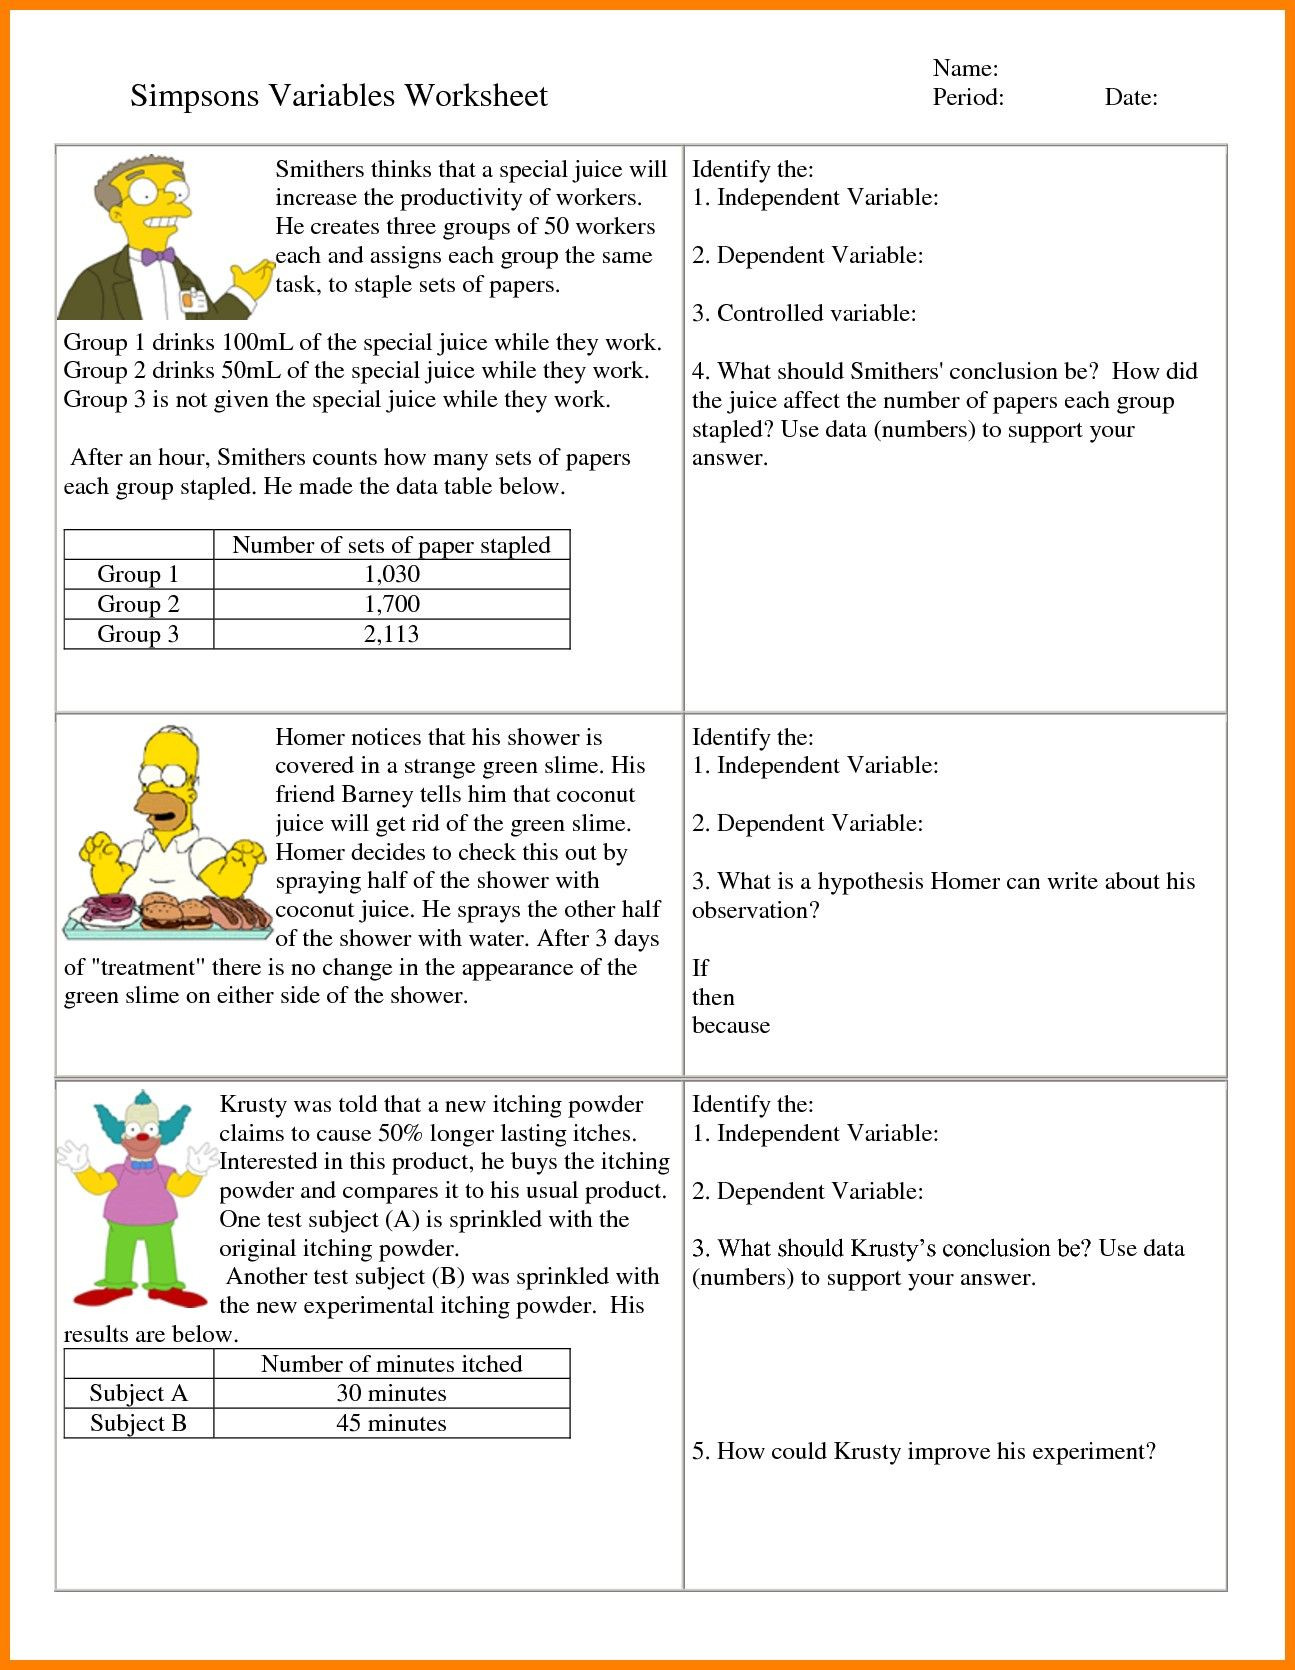 Scientific Method Worksheet High School Weblogs Worksheet Independent and Dependent Variables